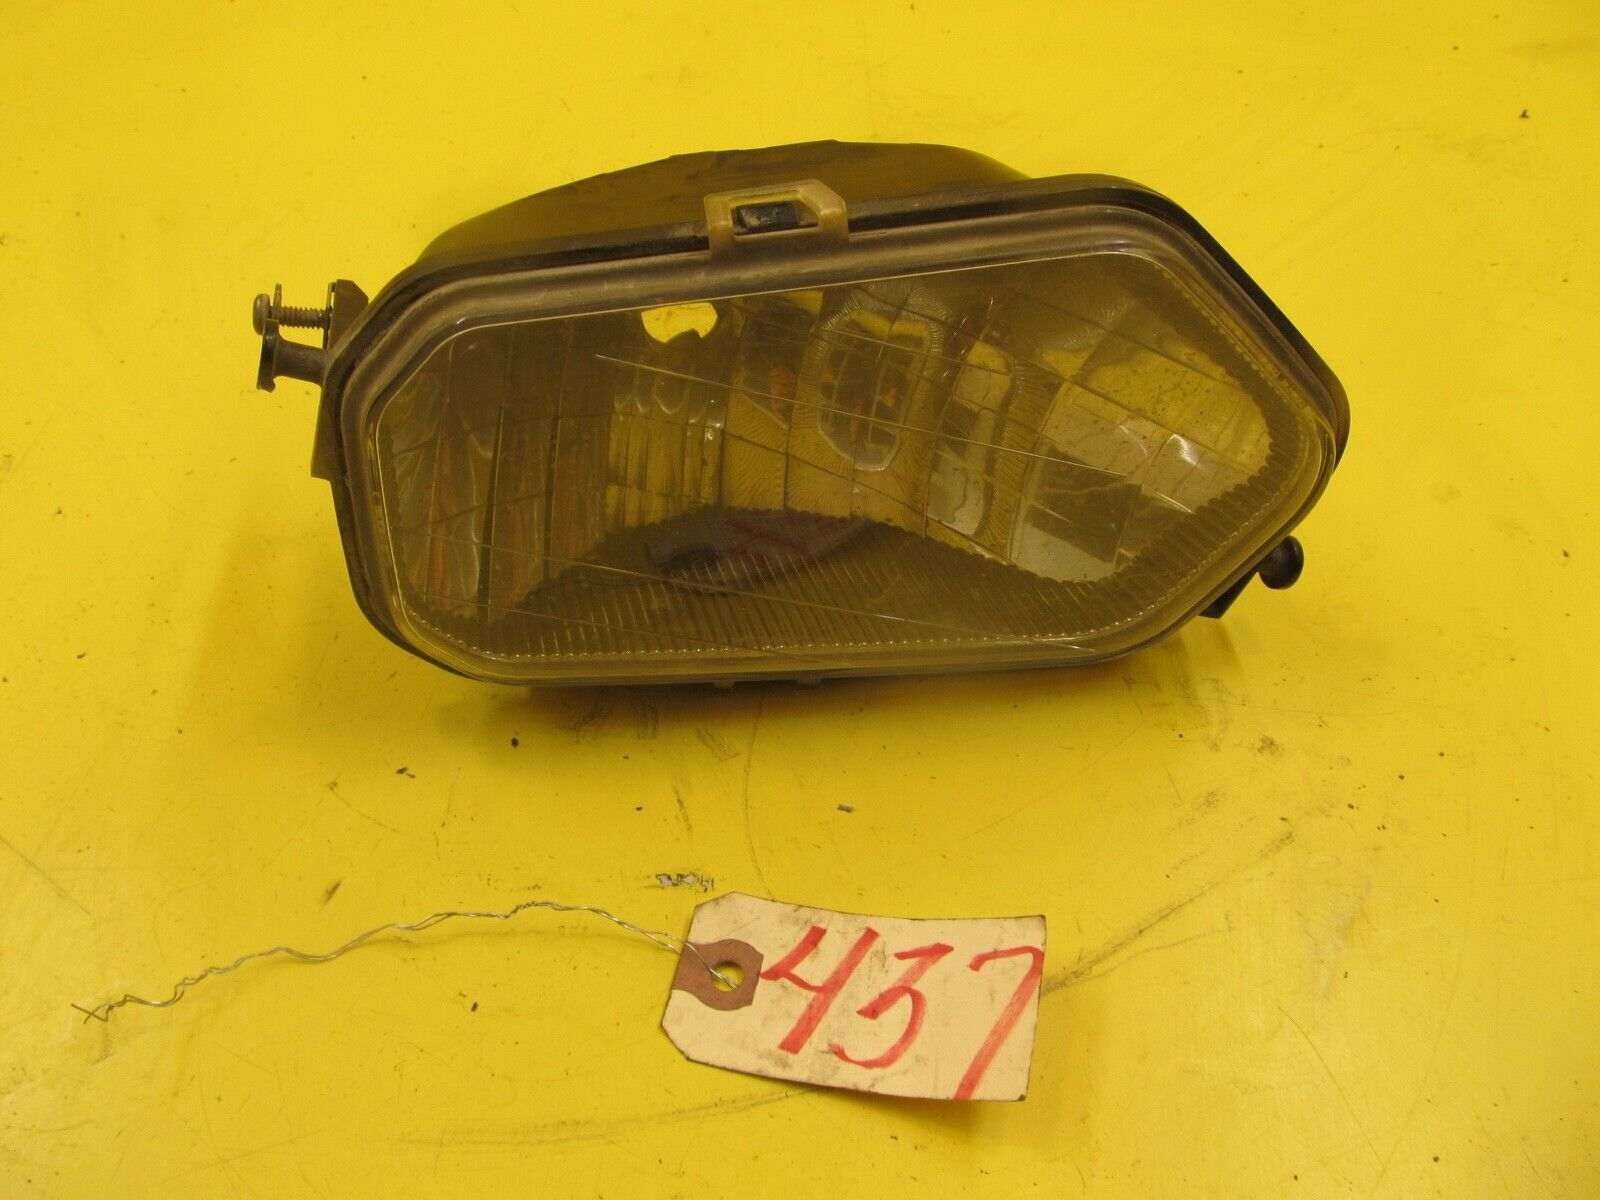 09-19 Polaris Ranger Sportsman ACE RZR Left Headlight 2410615 or 5856070